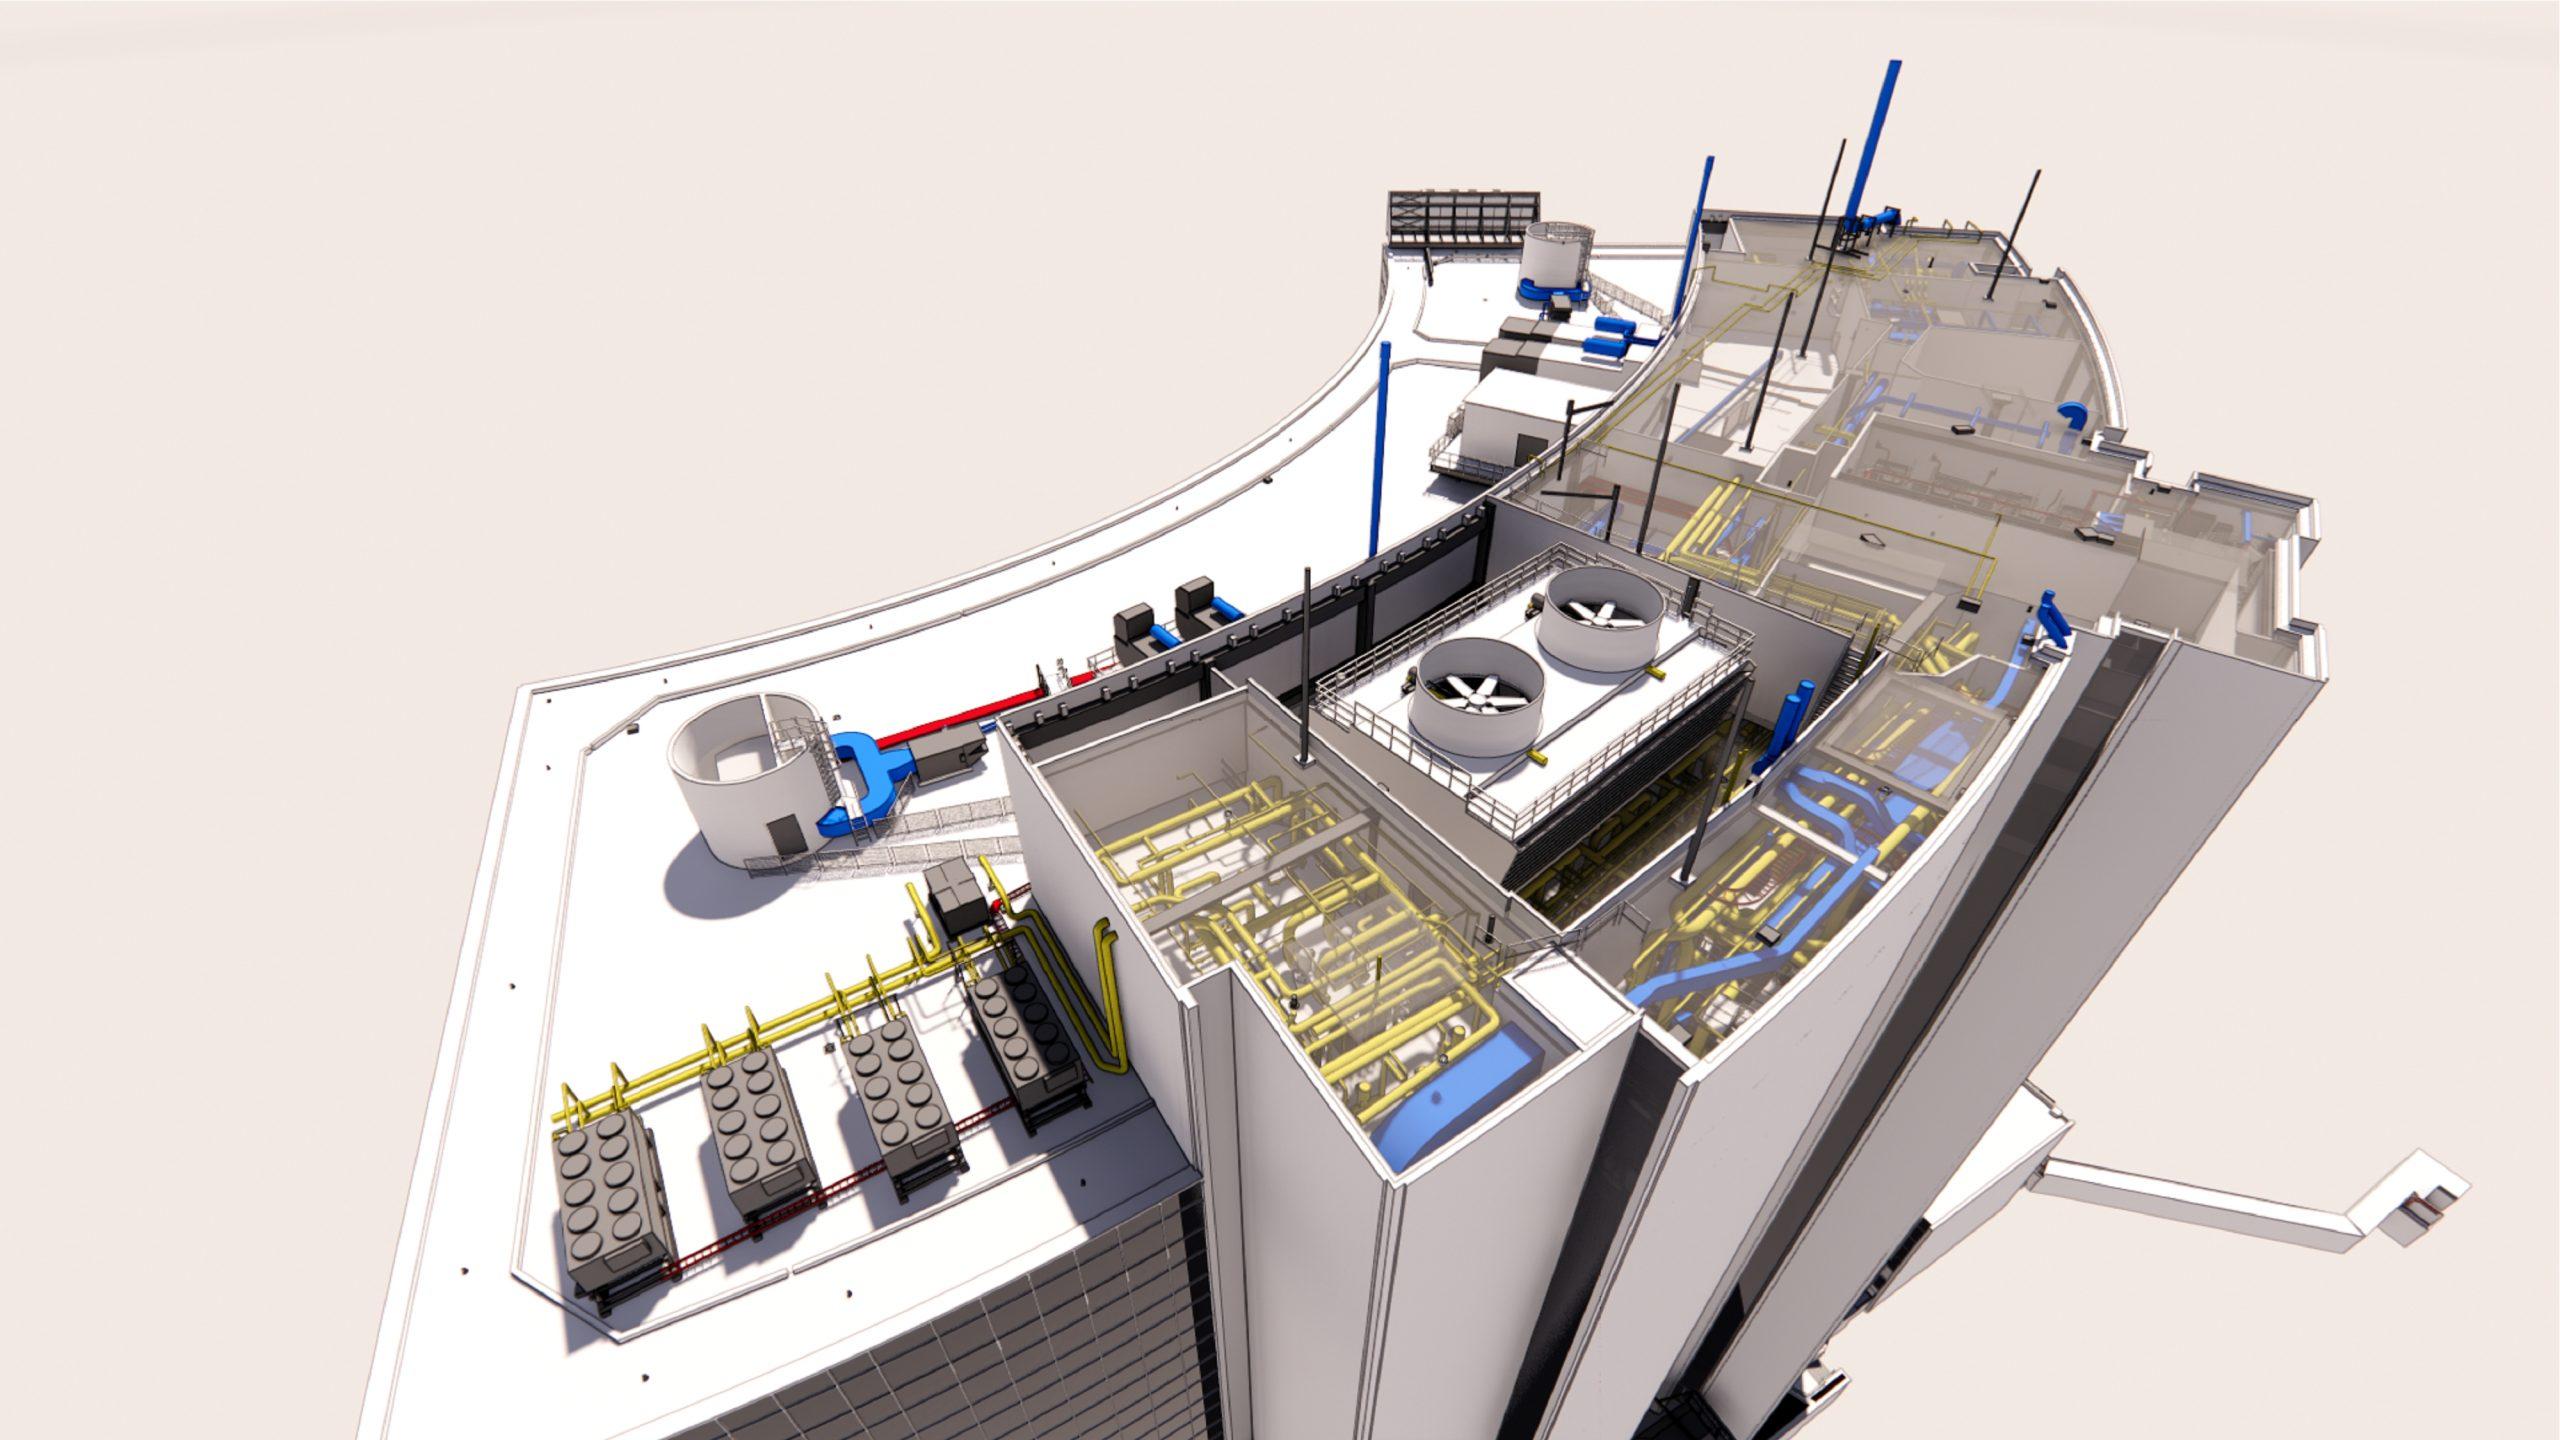 3D rendering, top view of 700 University Avenue, Toronto, no roof